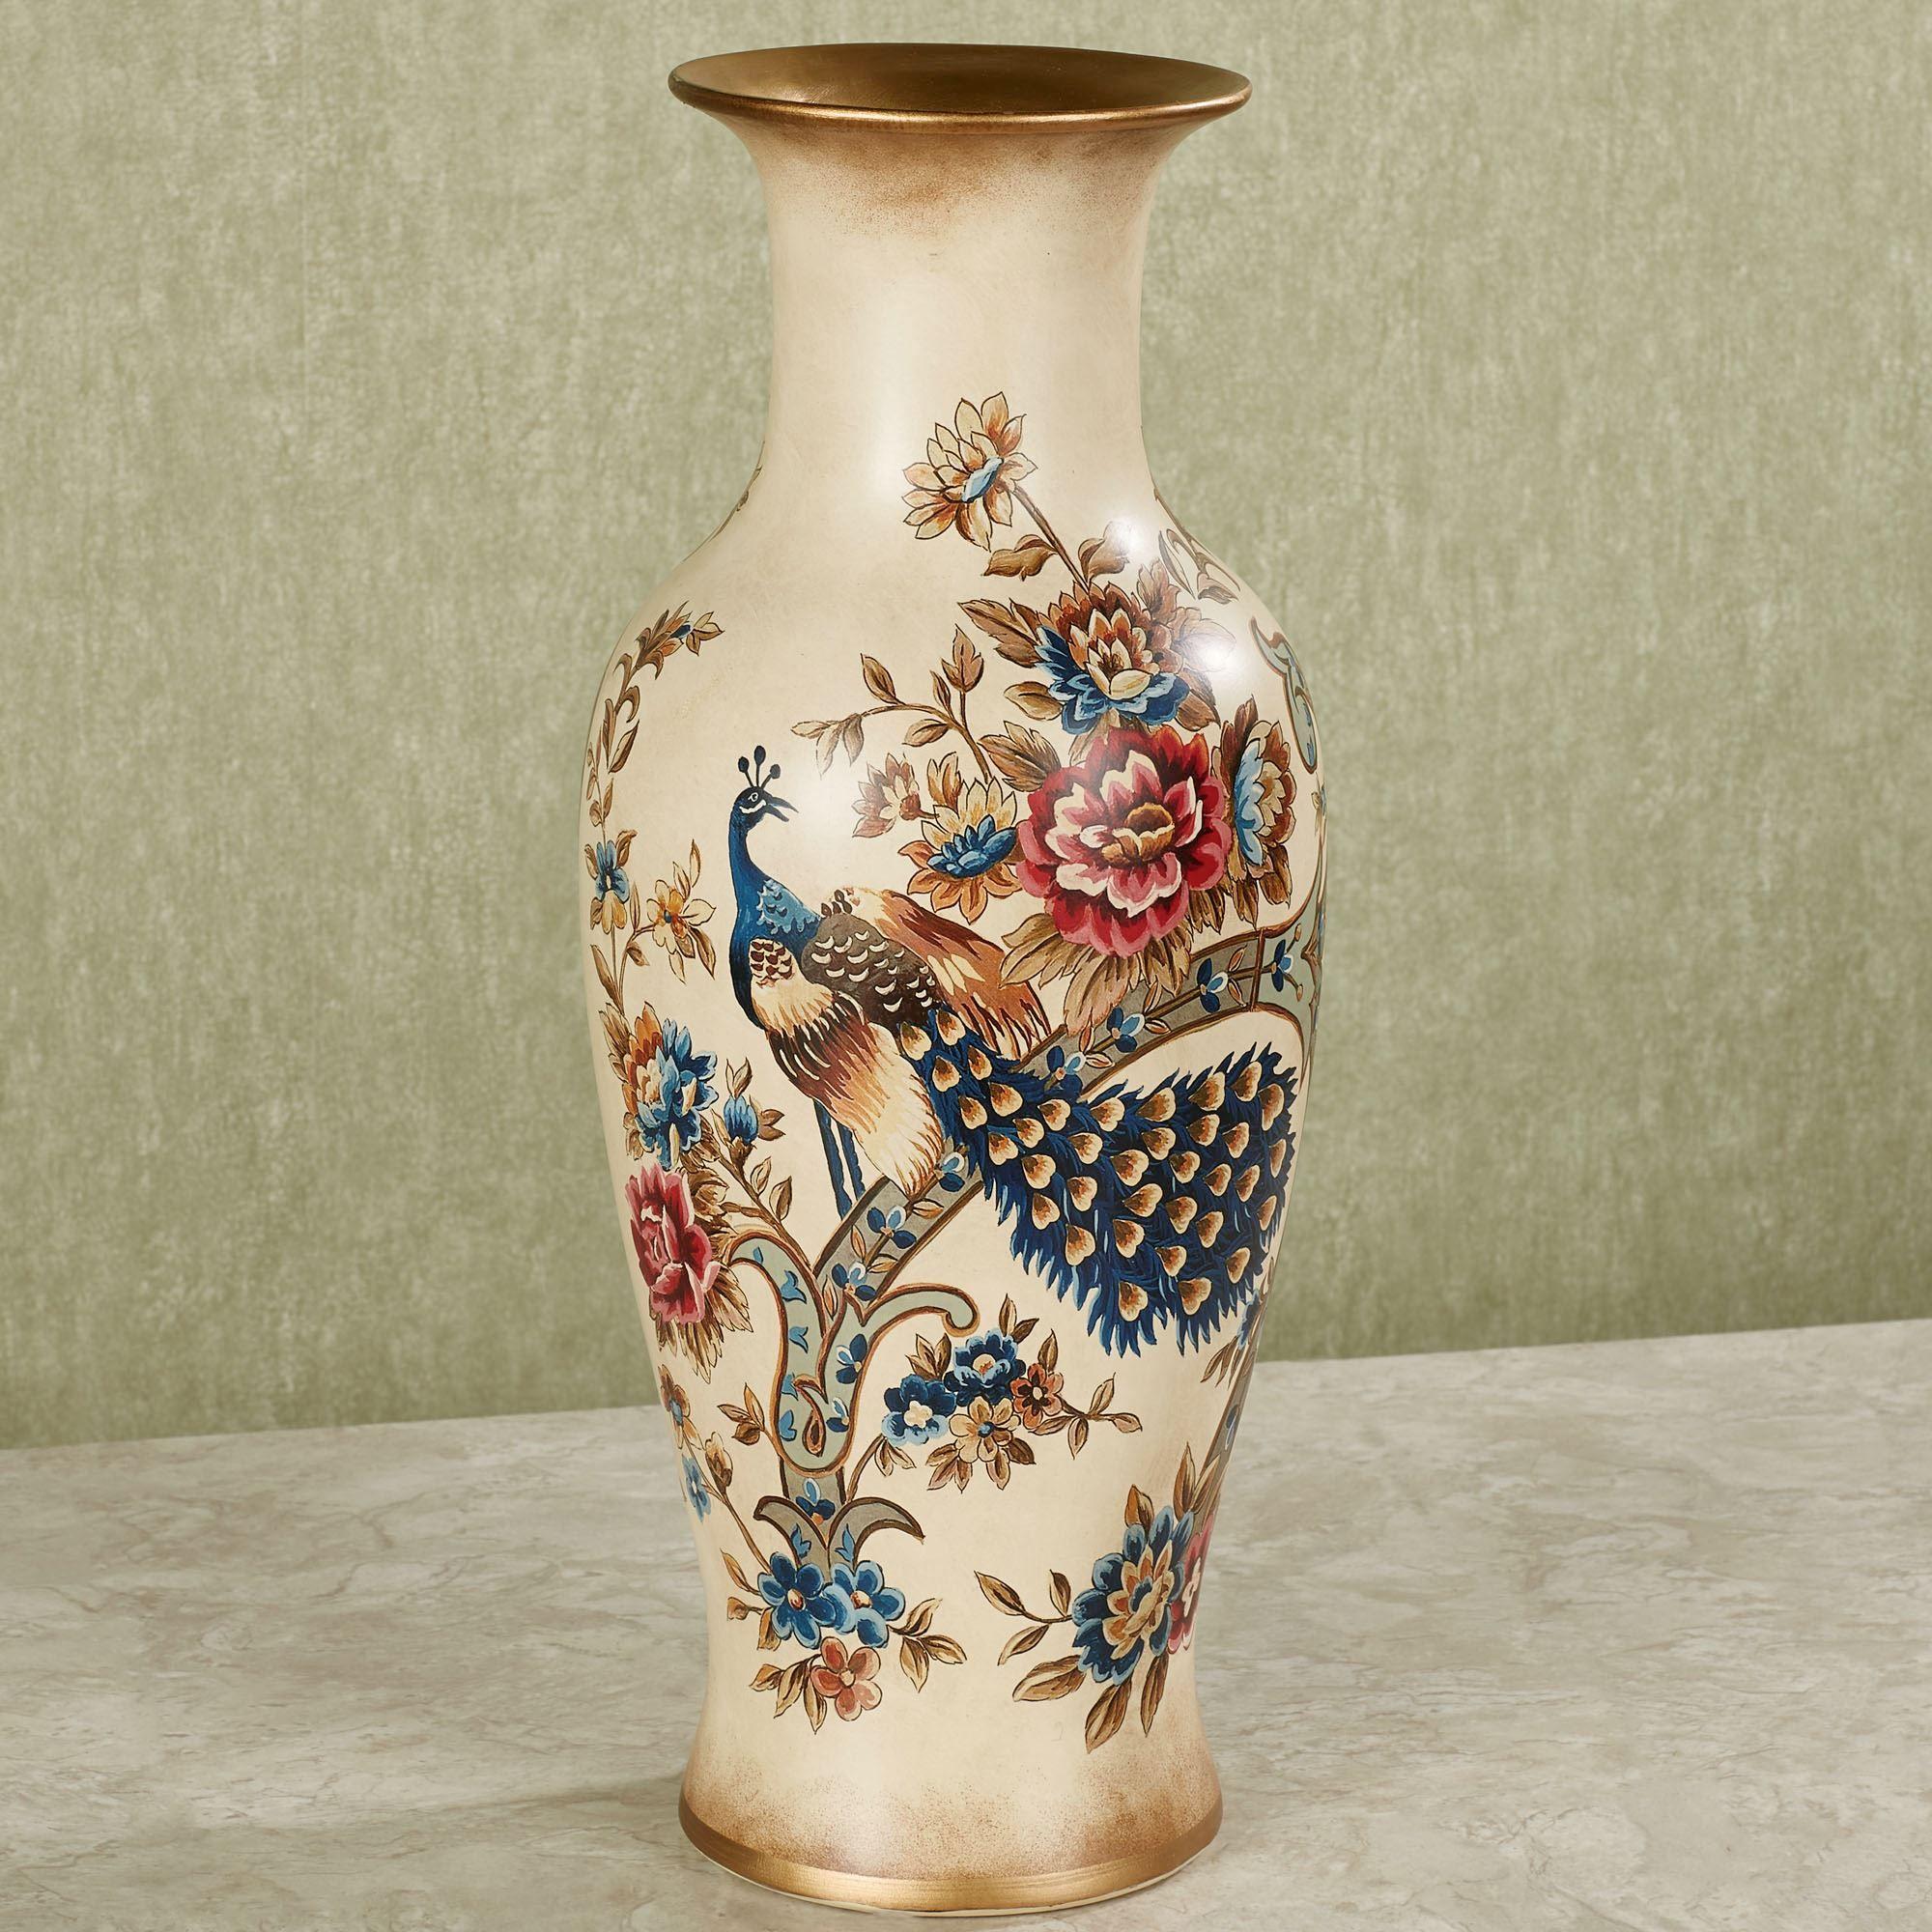 siroun peacock decorative ceramic vase. Black Bedroom Furniture Sets. Home Design Ideas